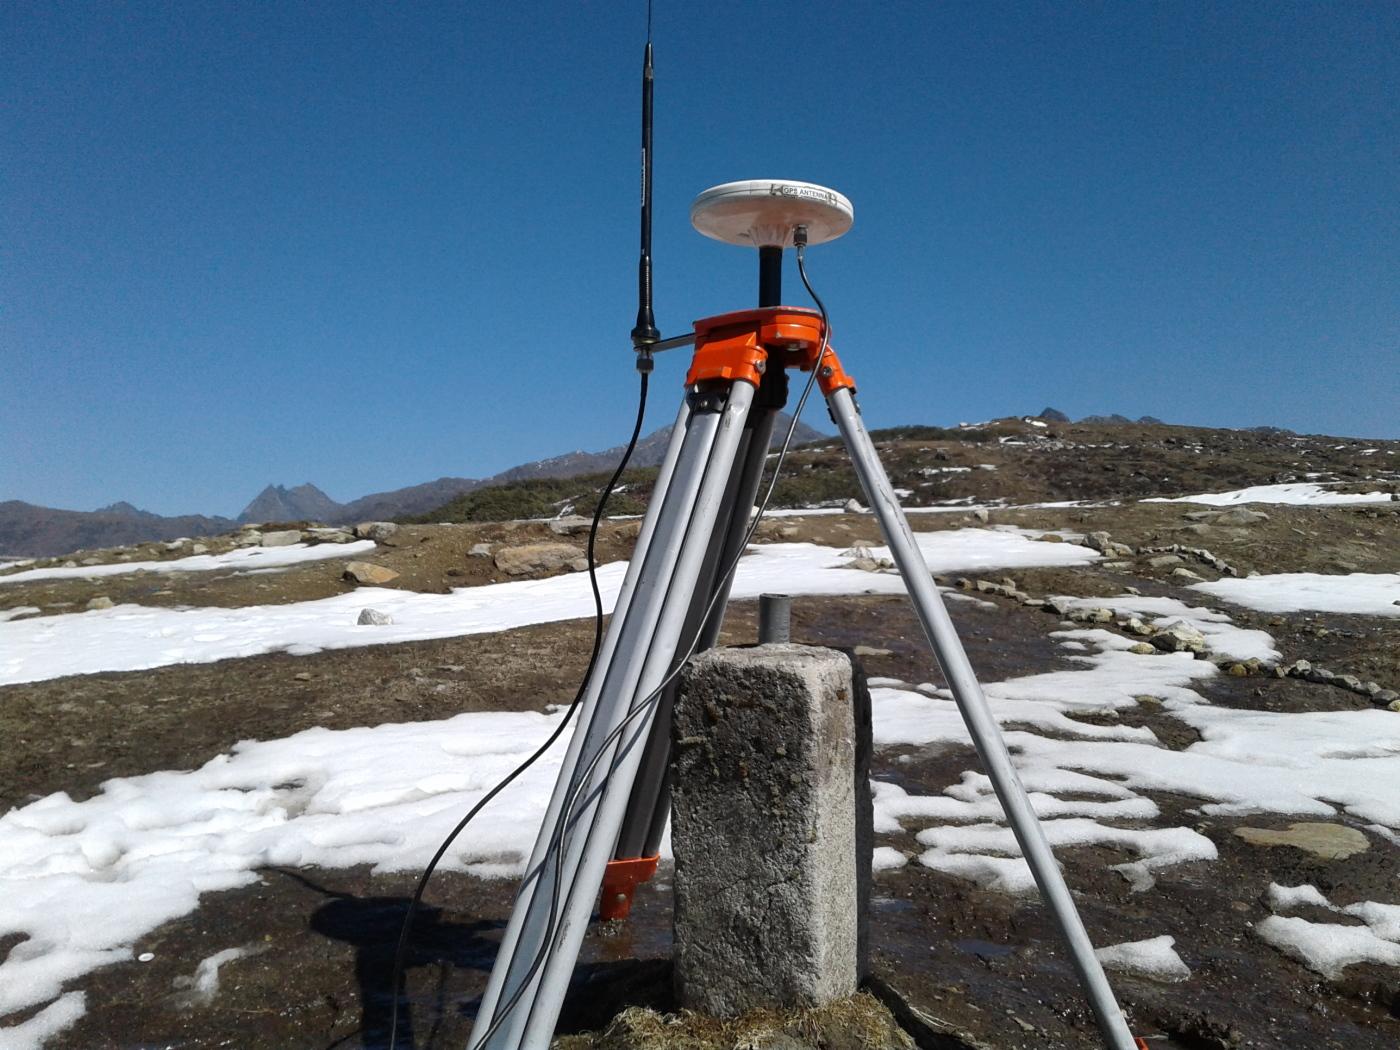 Surveying with DGPS